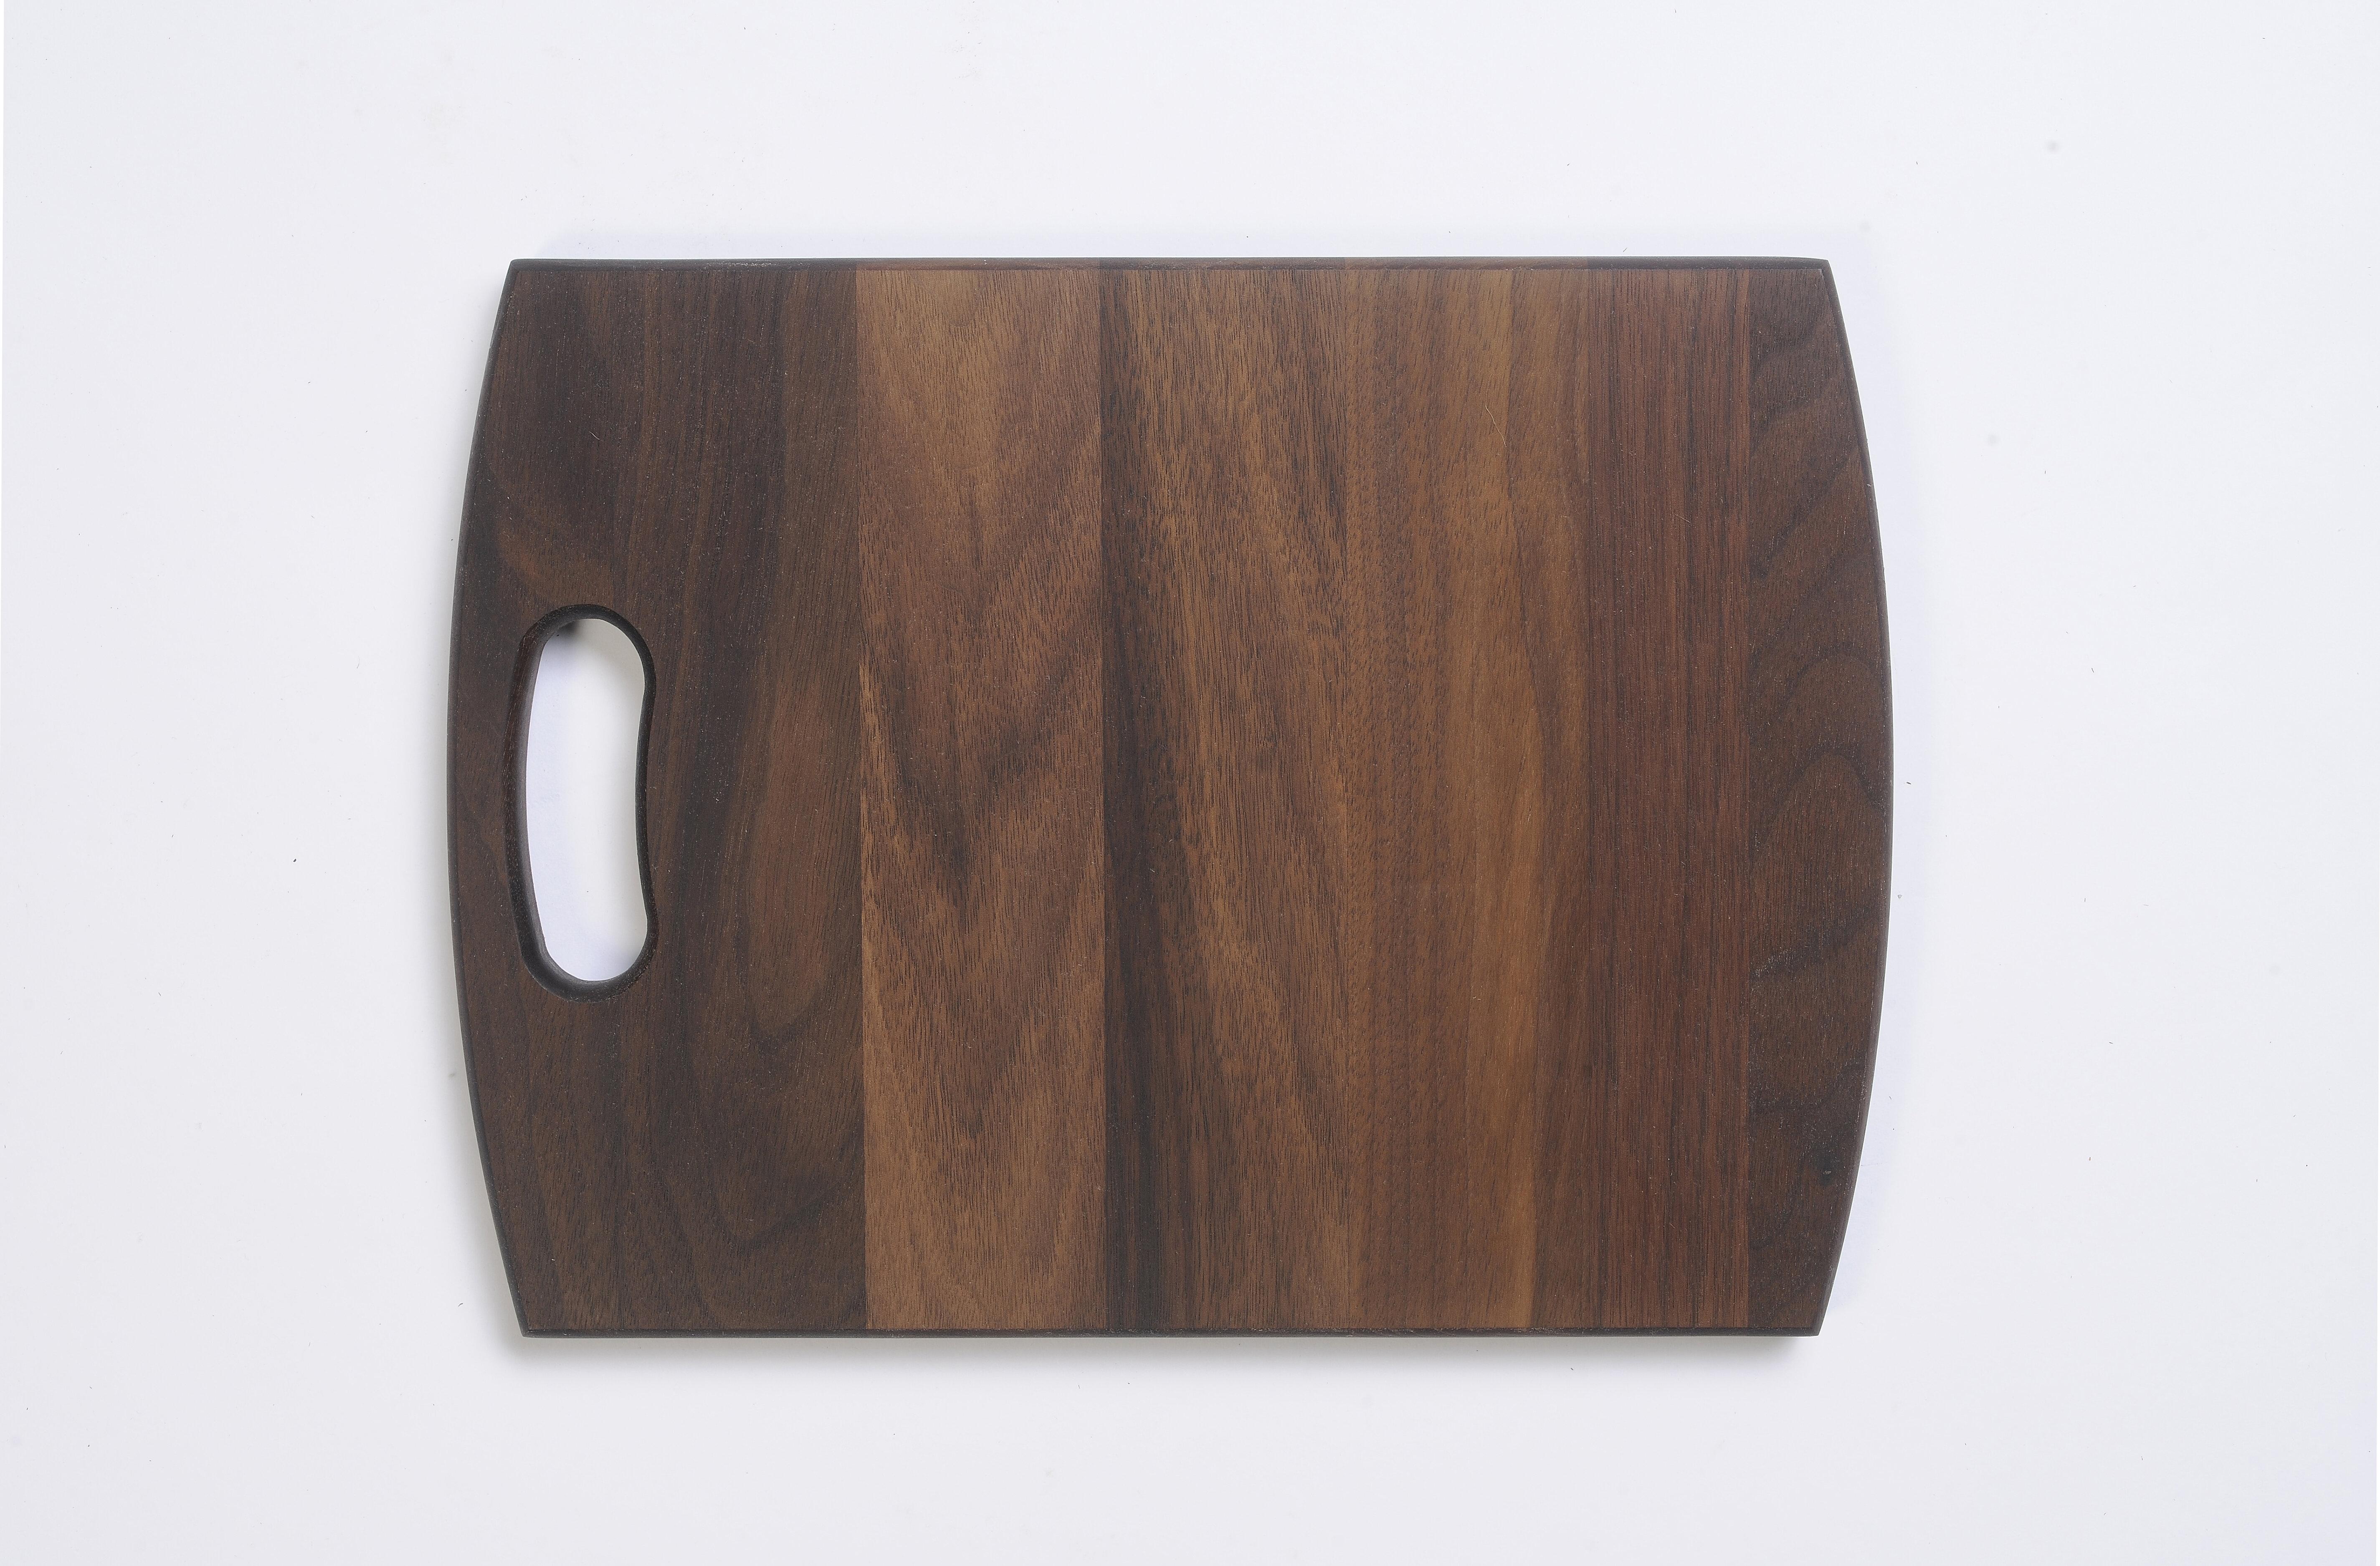 Warther Boards Walnut Wood Cutting Board Wayfair